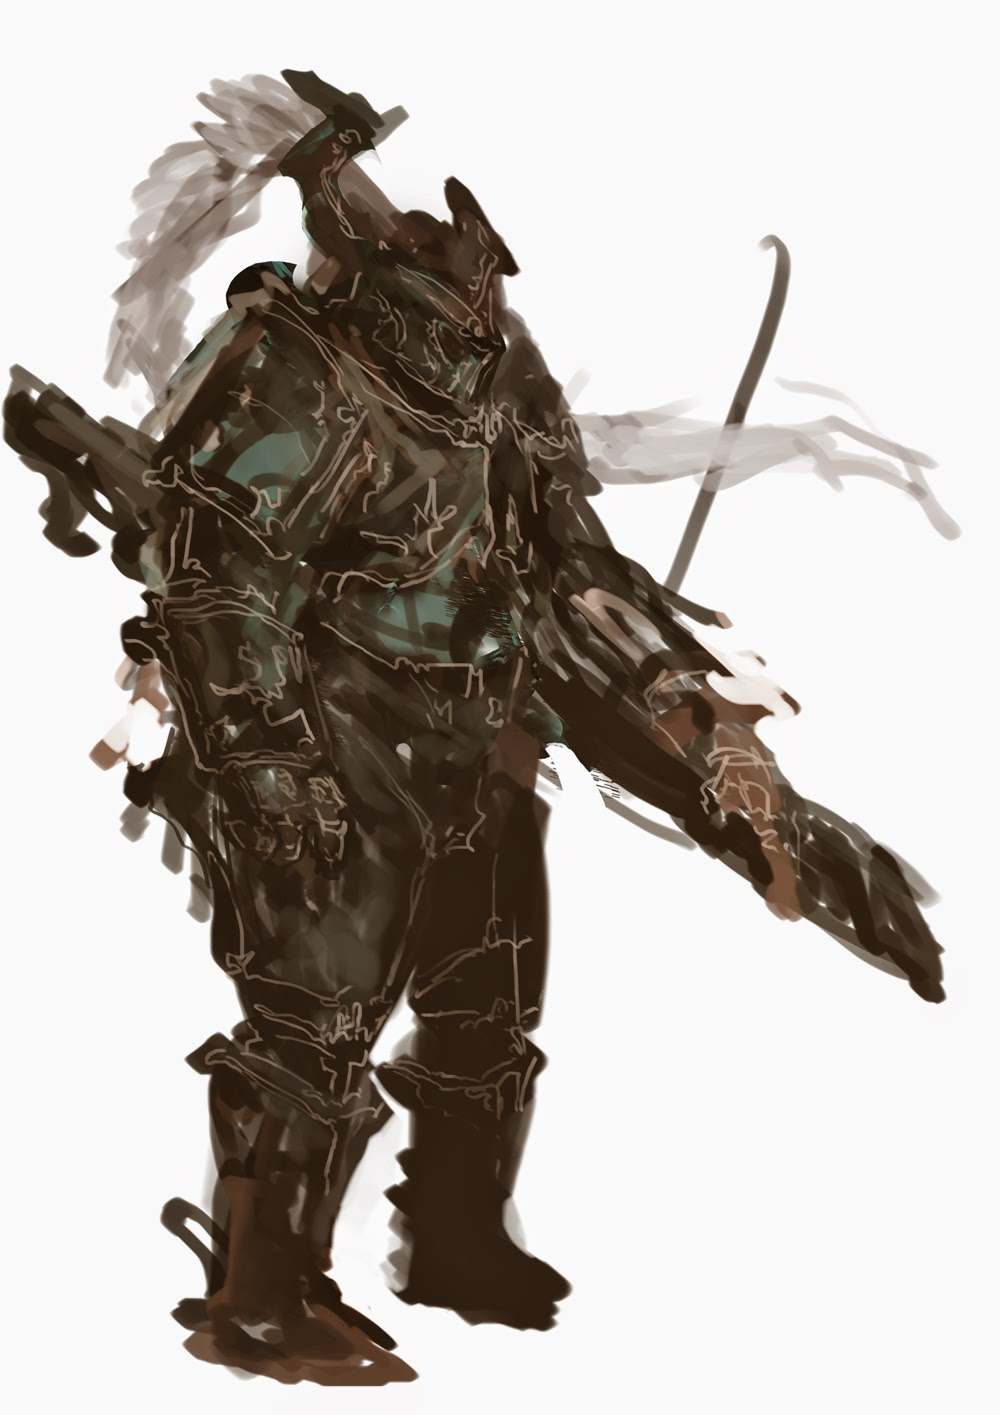 spitpaint,speedpaint,douglasderi,conceptart,sci-fi,fantasy,war,warrior,swordmaster,art,deri,deriart,how to paint, photoshop brushes, brushes, how to draw, como desenhar,